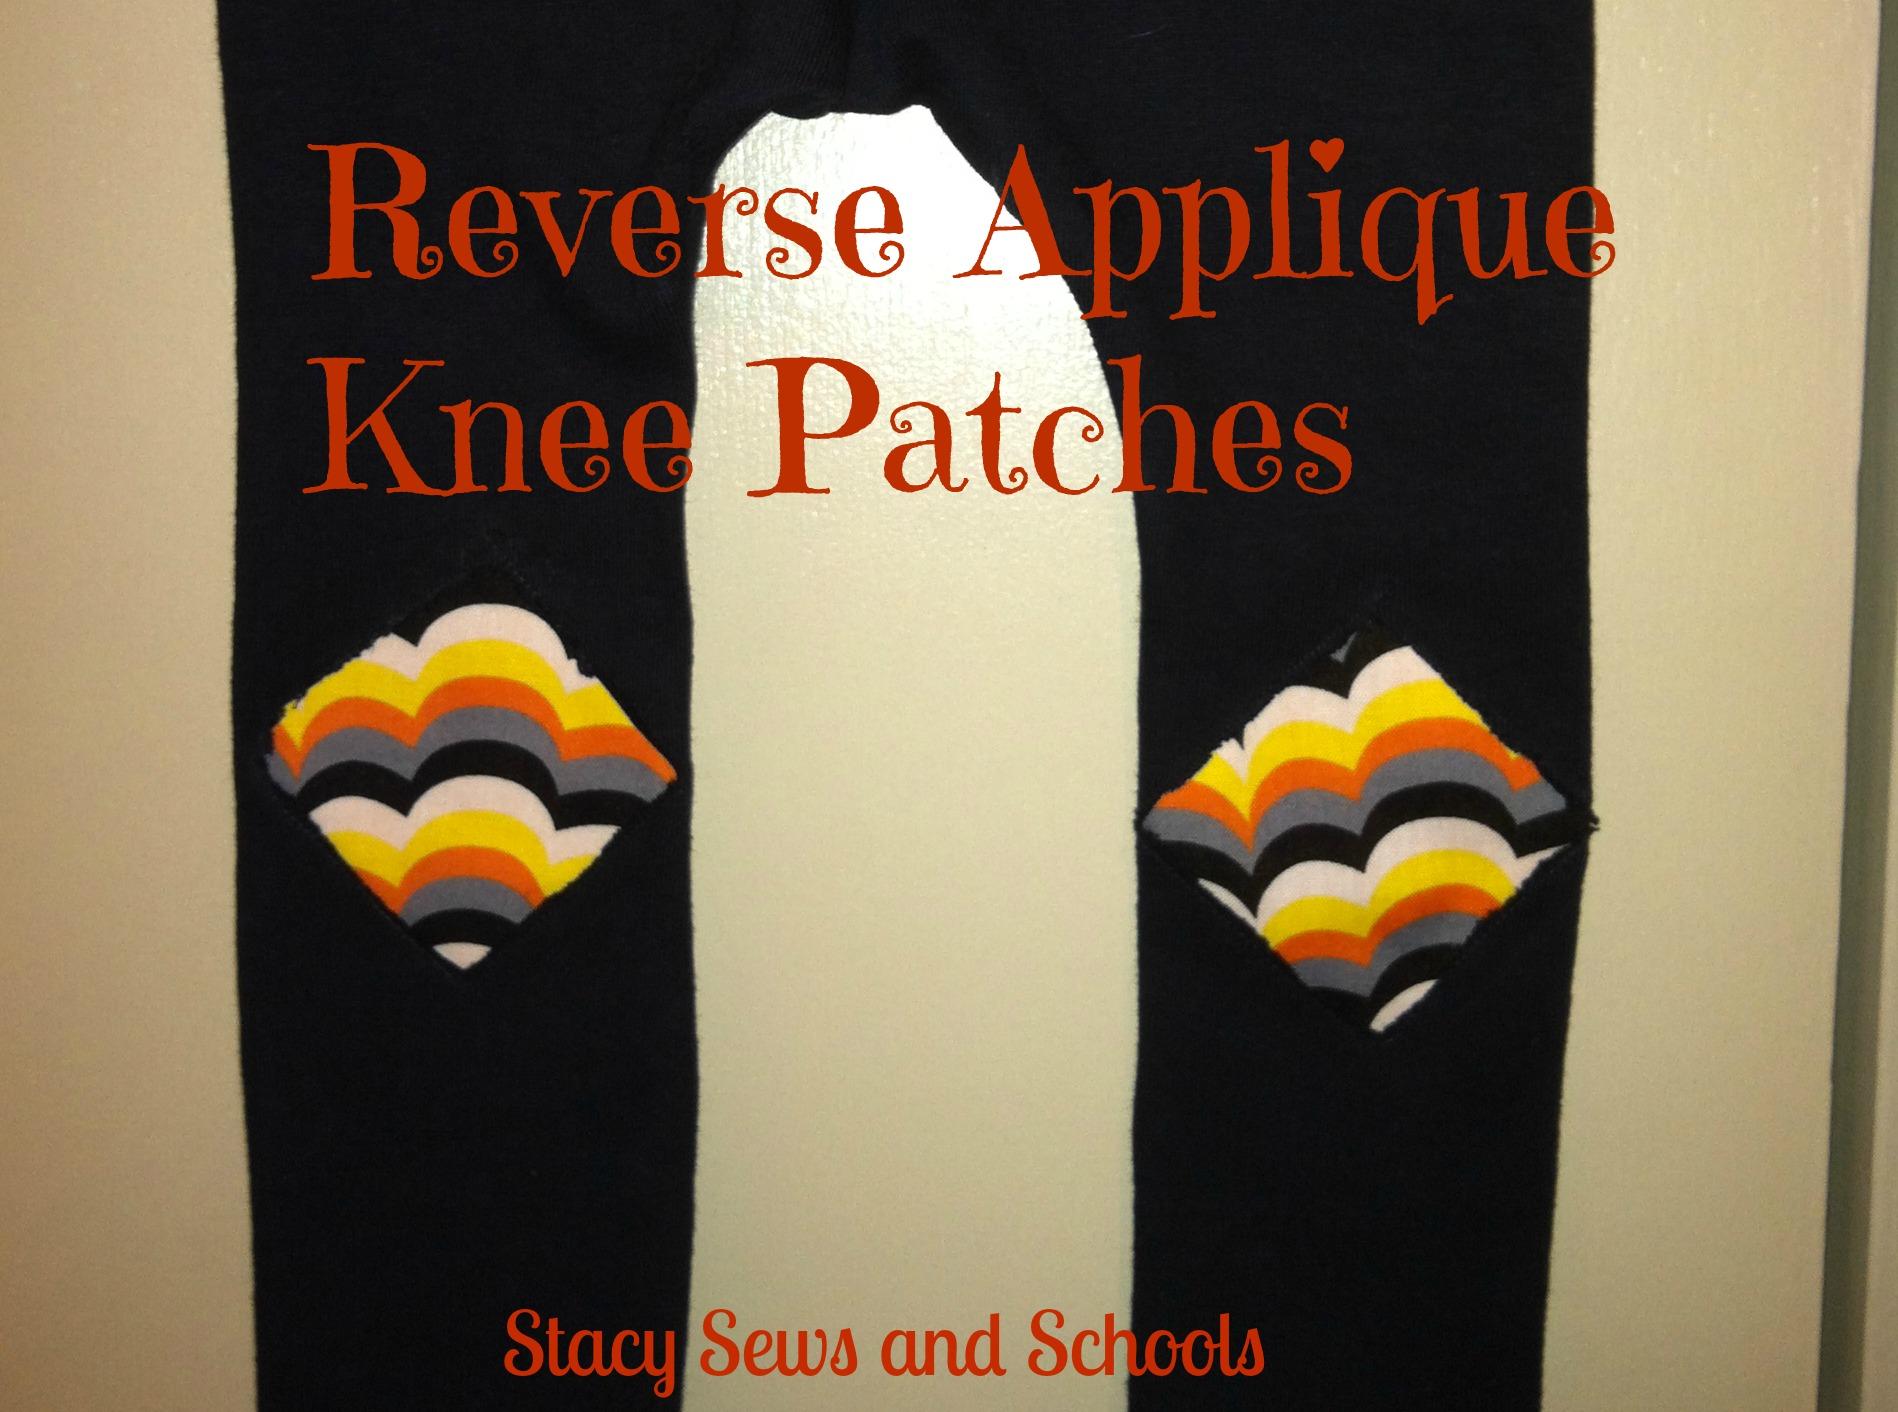 Reverse Applique Knee Patches 034